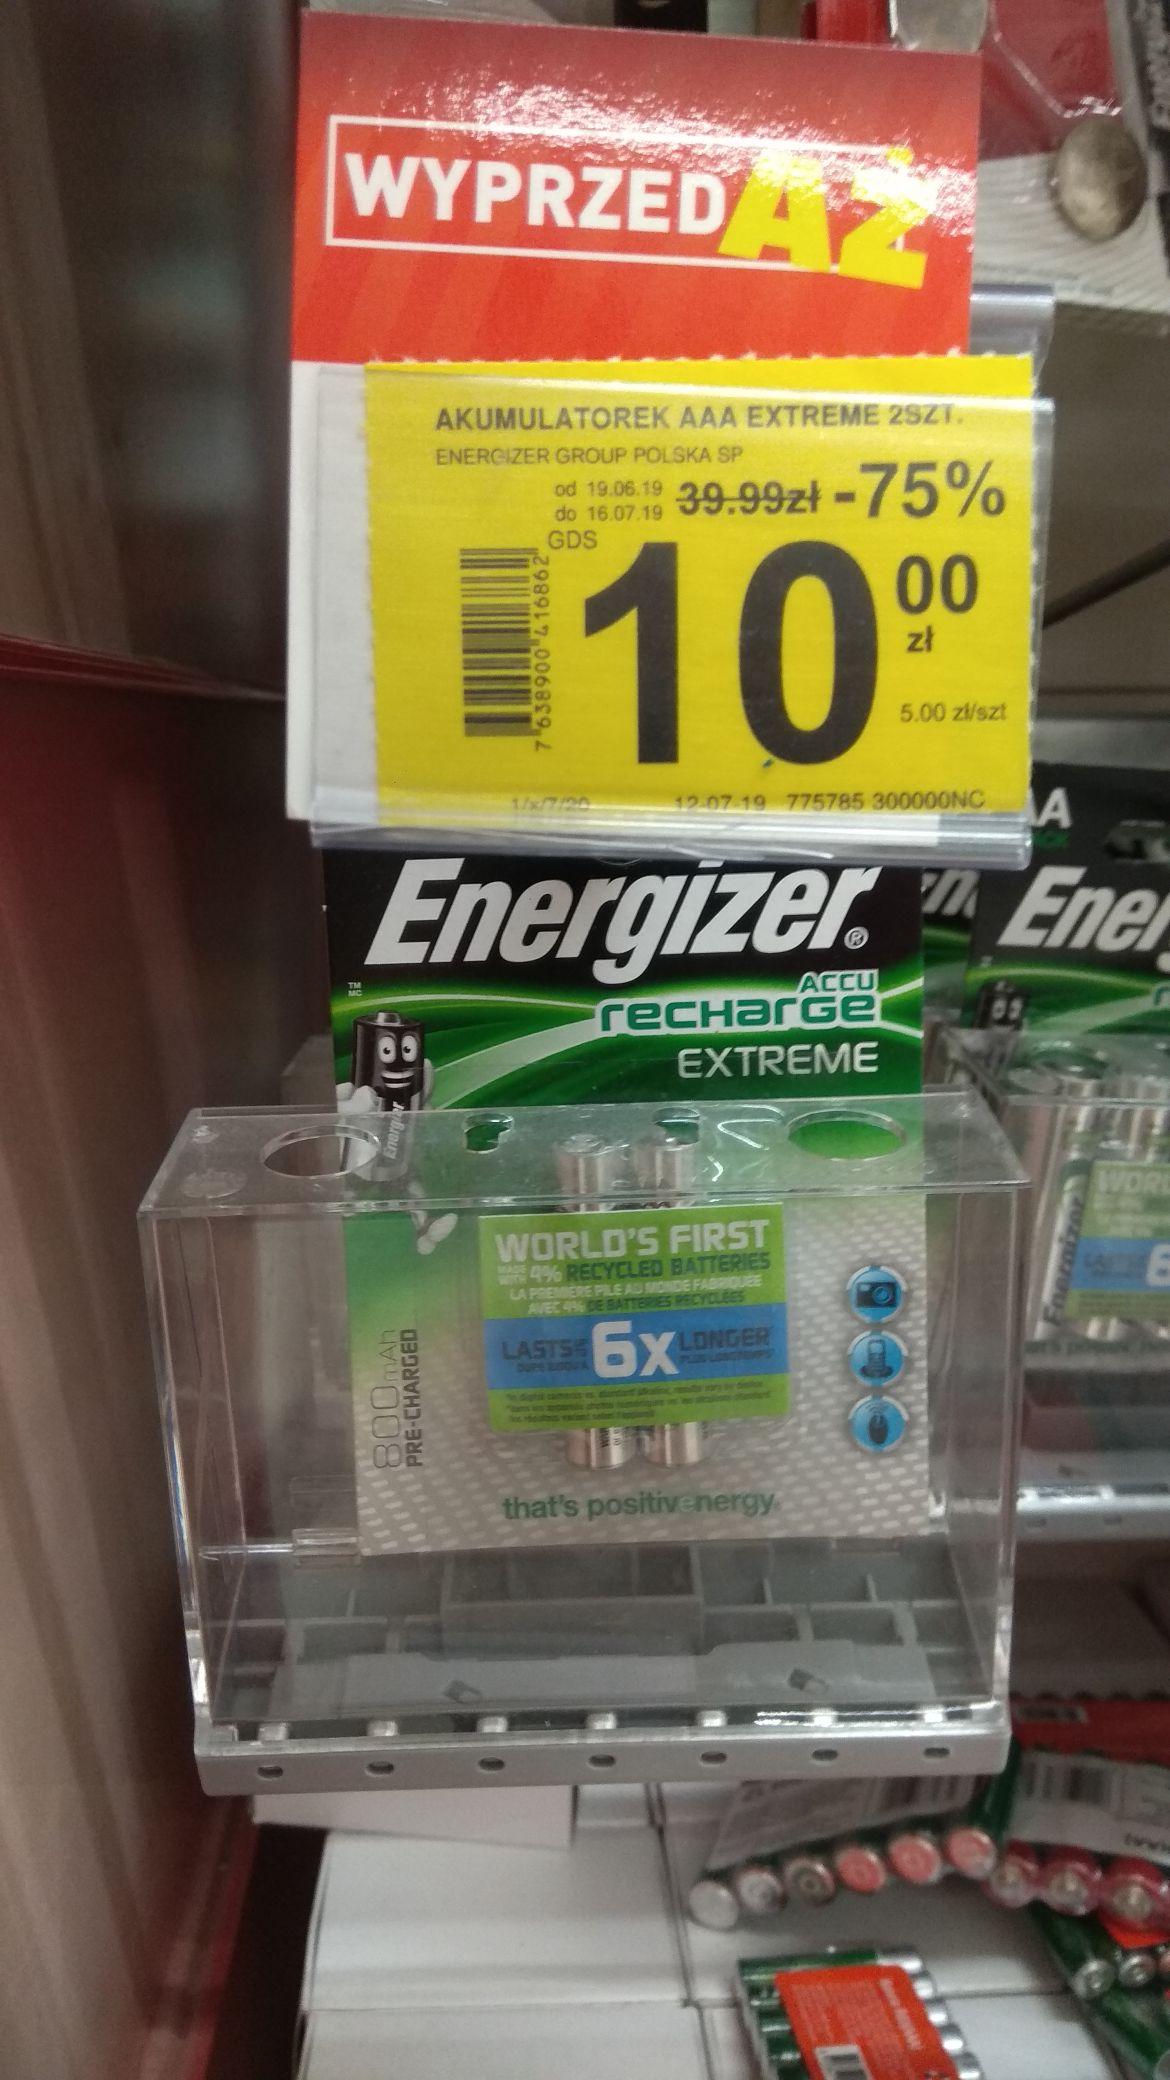 Akumulatorki Energizer Extreme AAA 800 mAh 2 szt Carrefour Skarżysko Kamienna